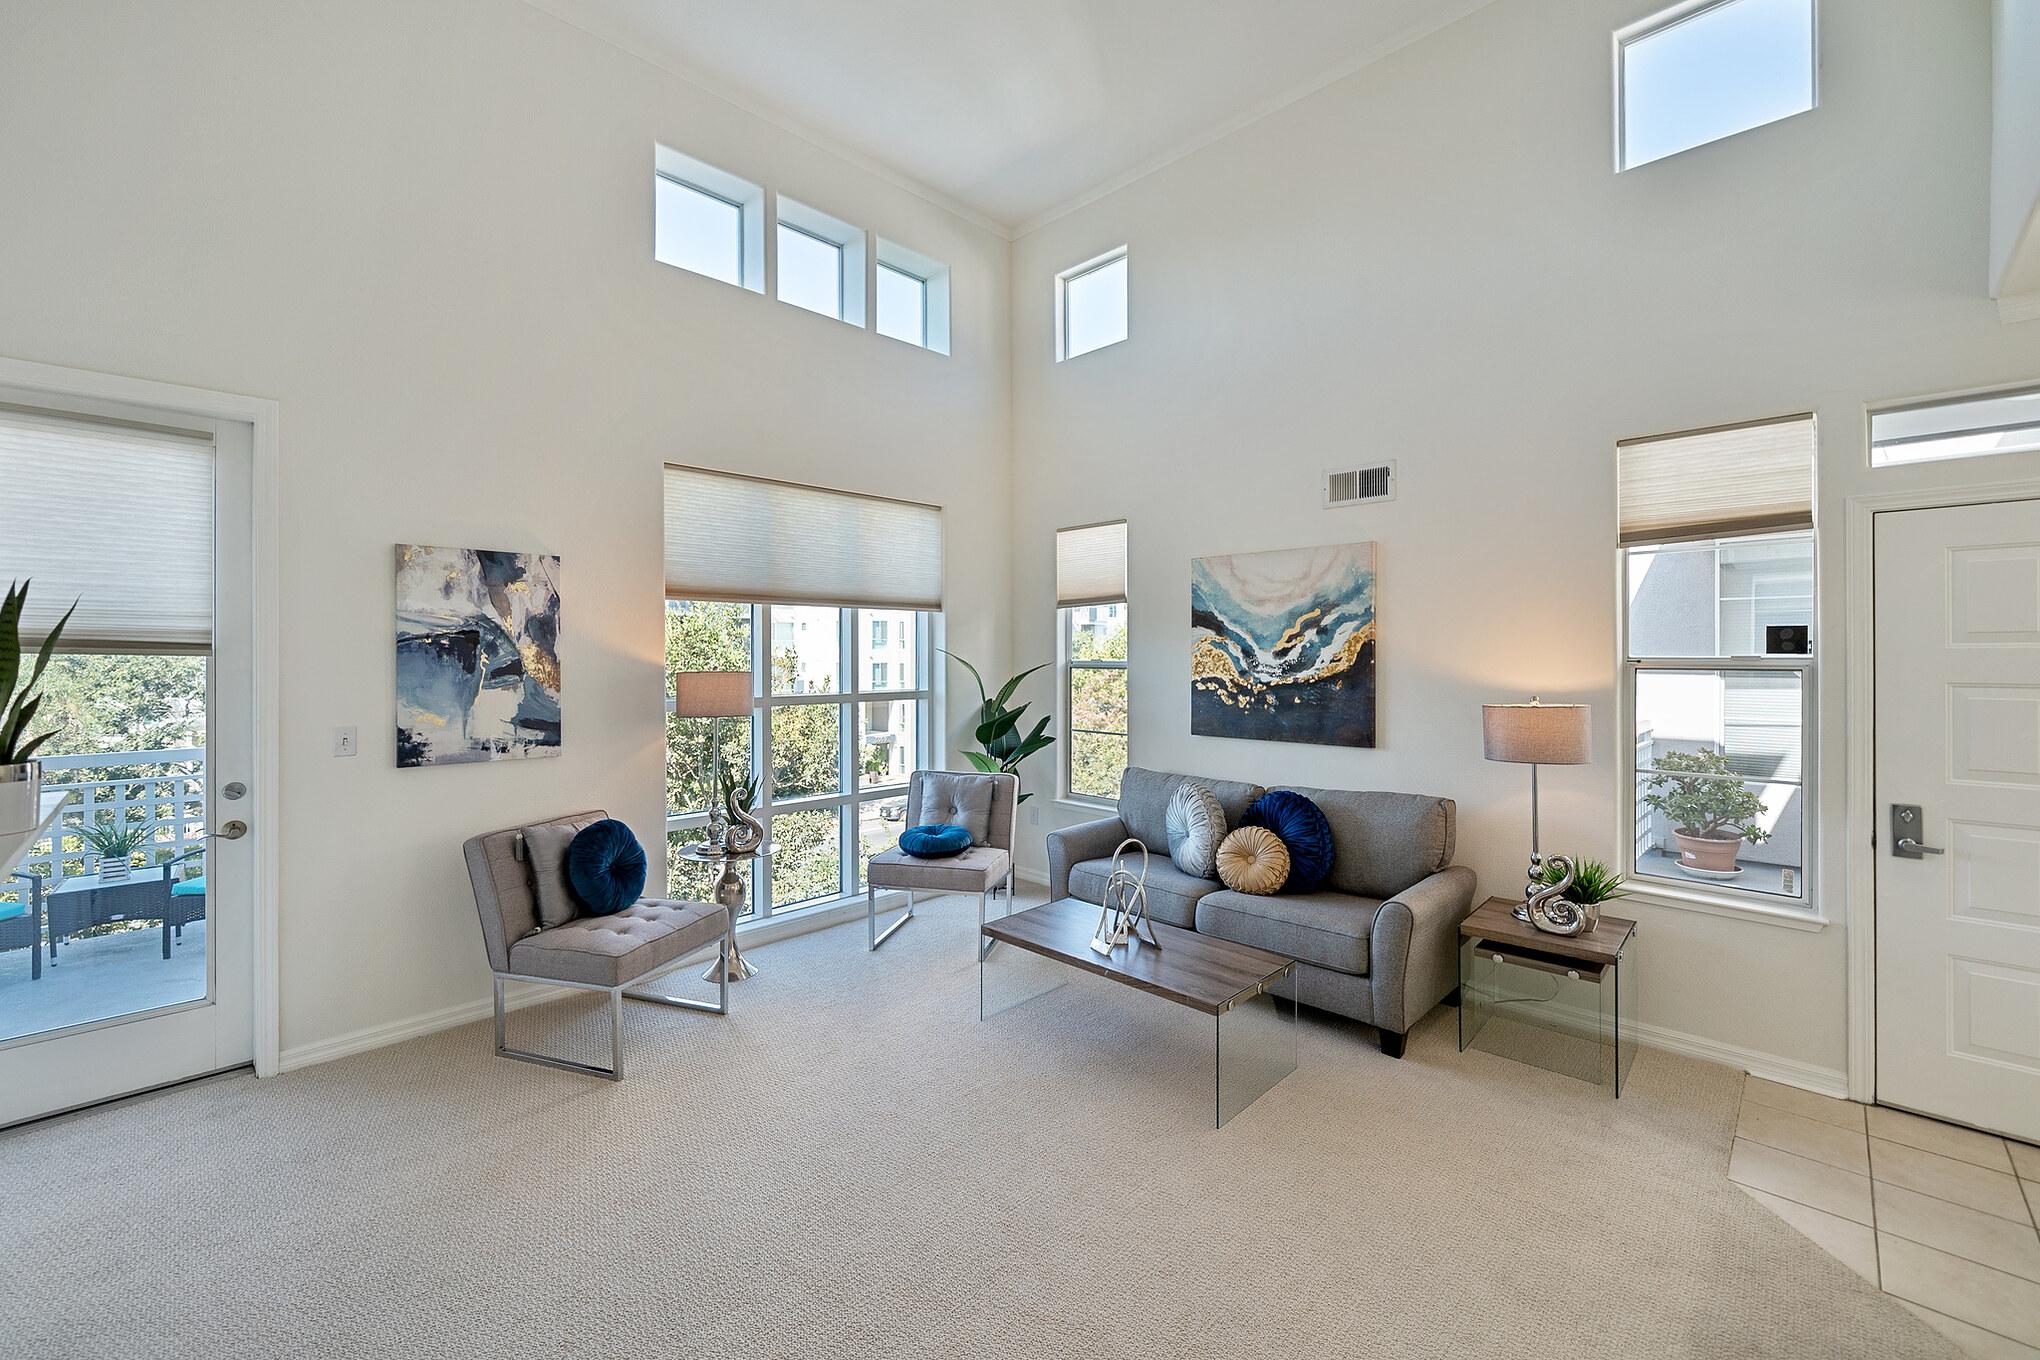 home for sale – 3901 Lick Mill 340 Santa Clara